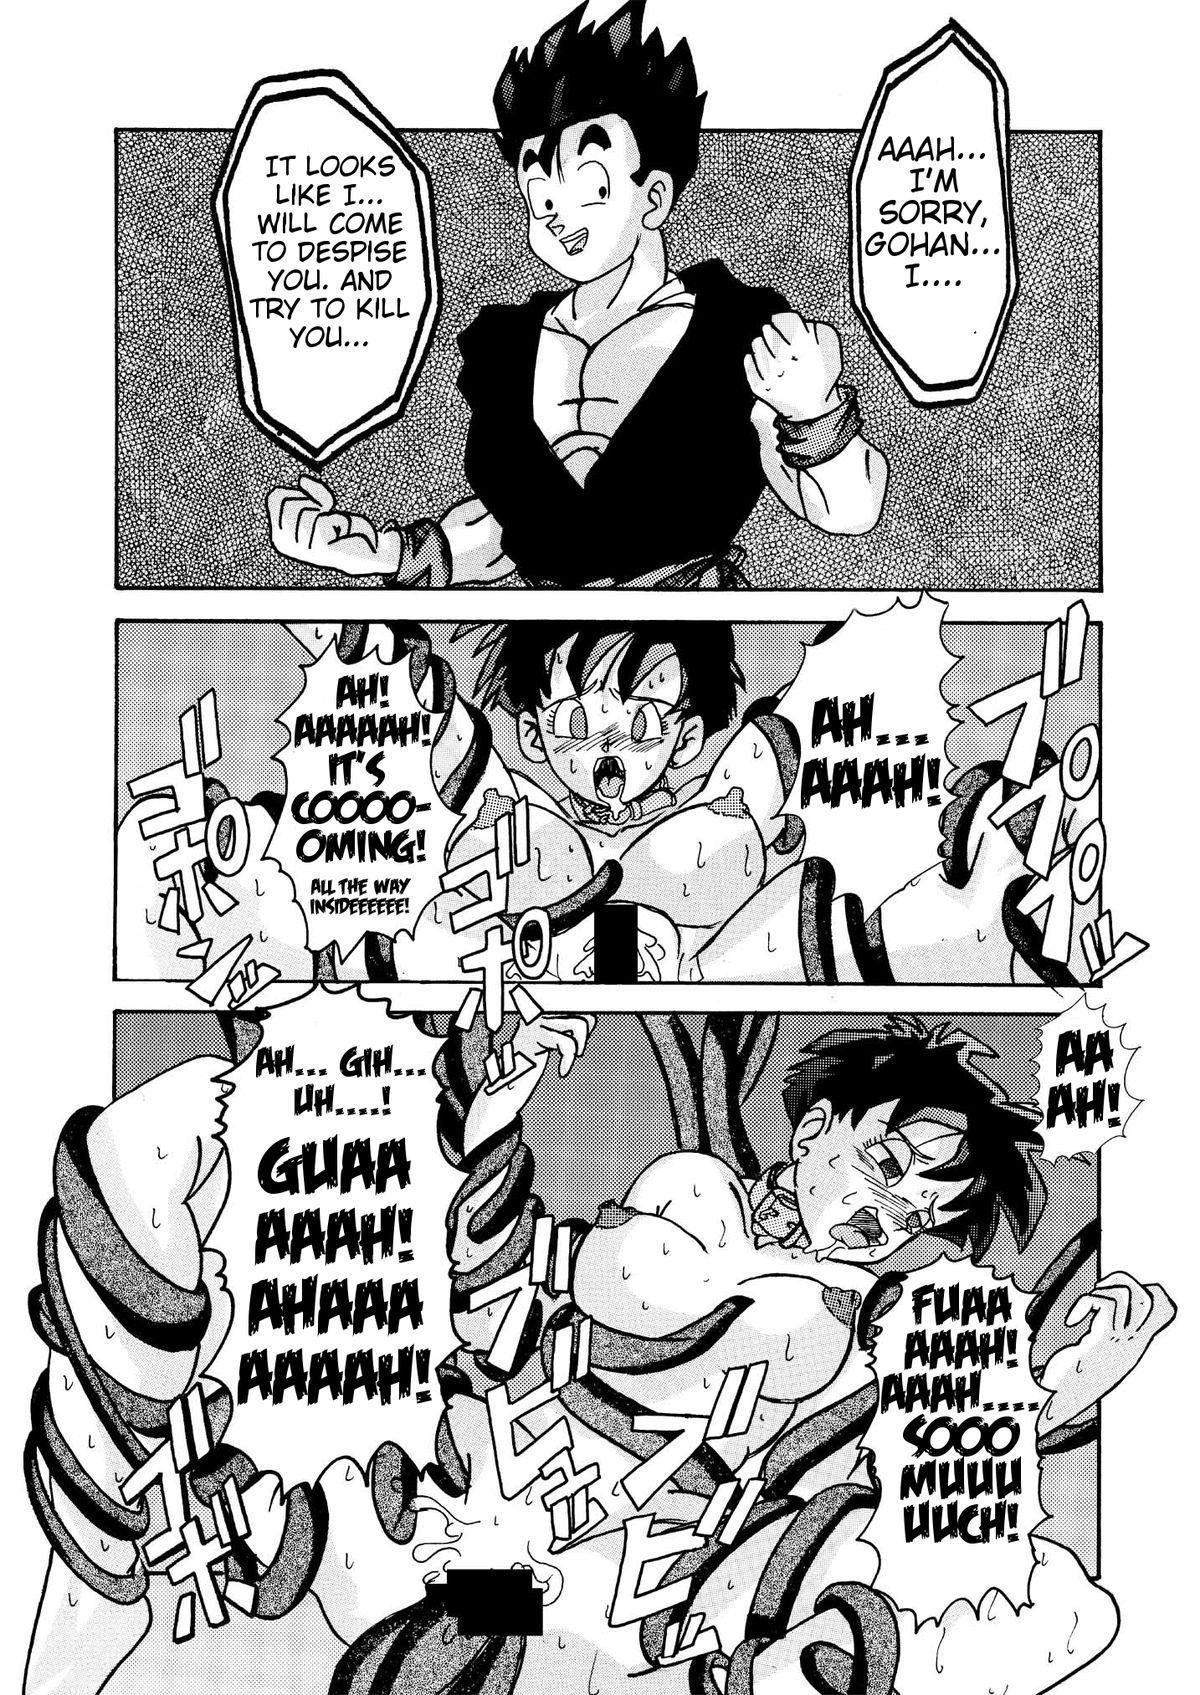 [Light Rate Port Pink] Tanjou!! Aku no Onna Senshi - Videl Sennou Kaizou Keikaku | Birth of an evil female soldier - The Videl brainwashing project  (Dragon Ball Z) [English] [DarkSpooky] 22